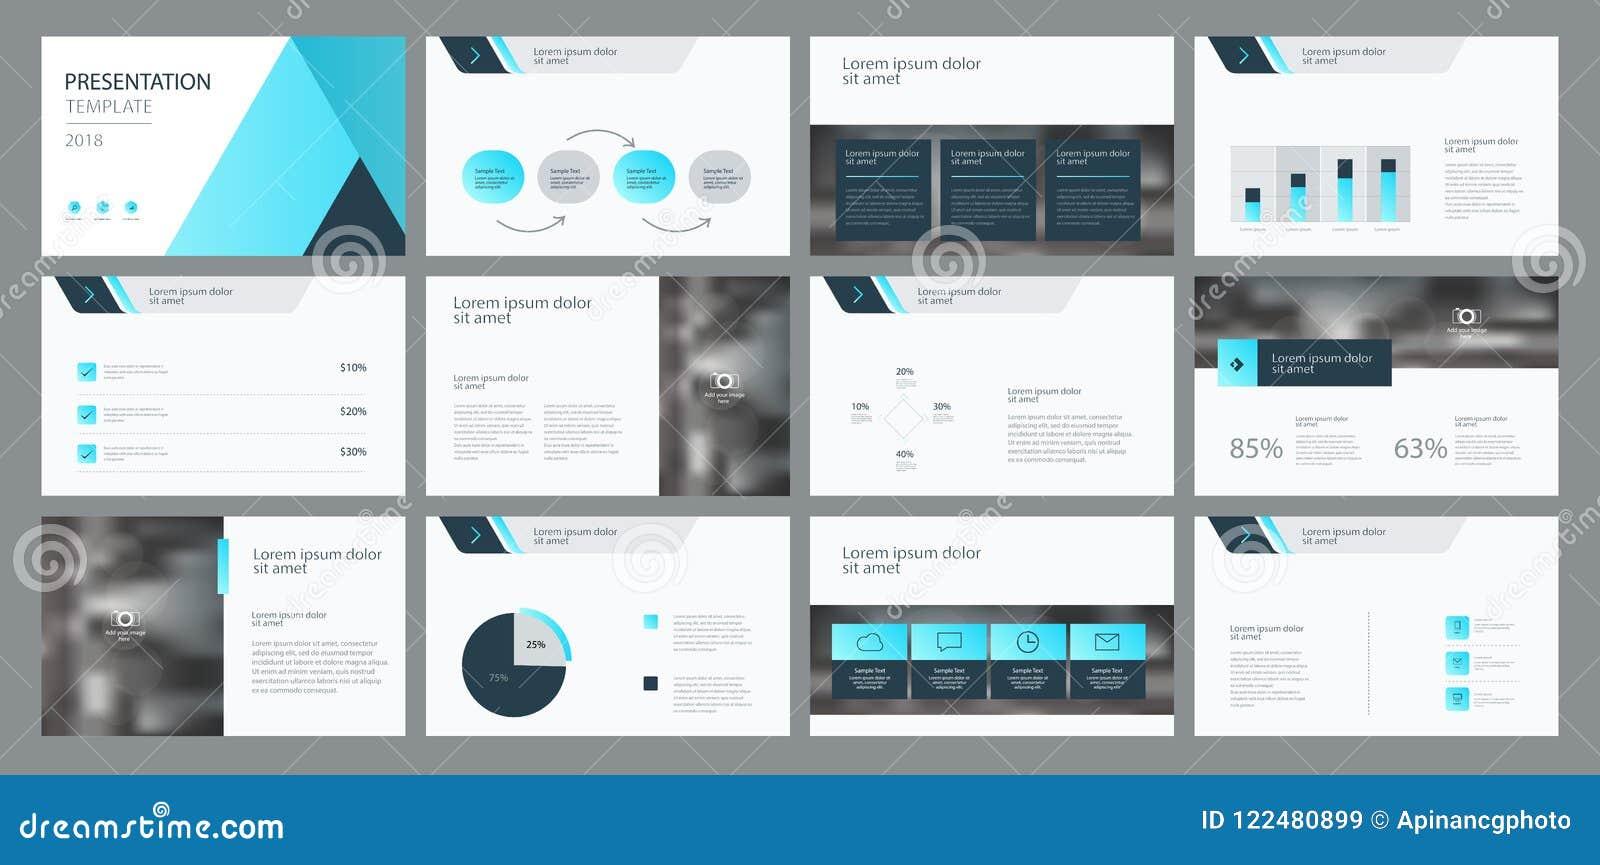 company profile elements